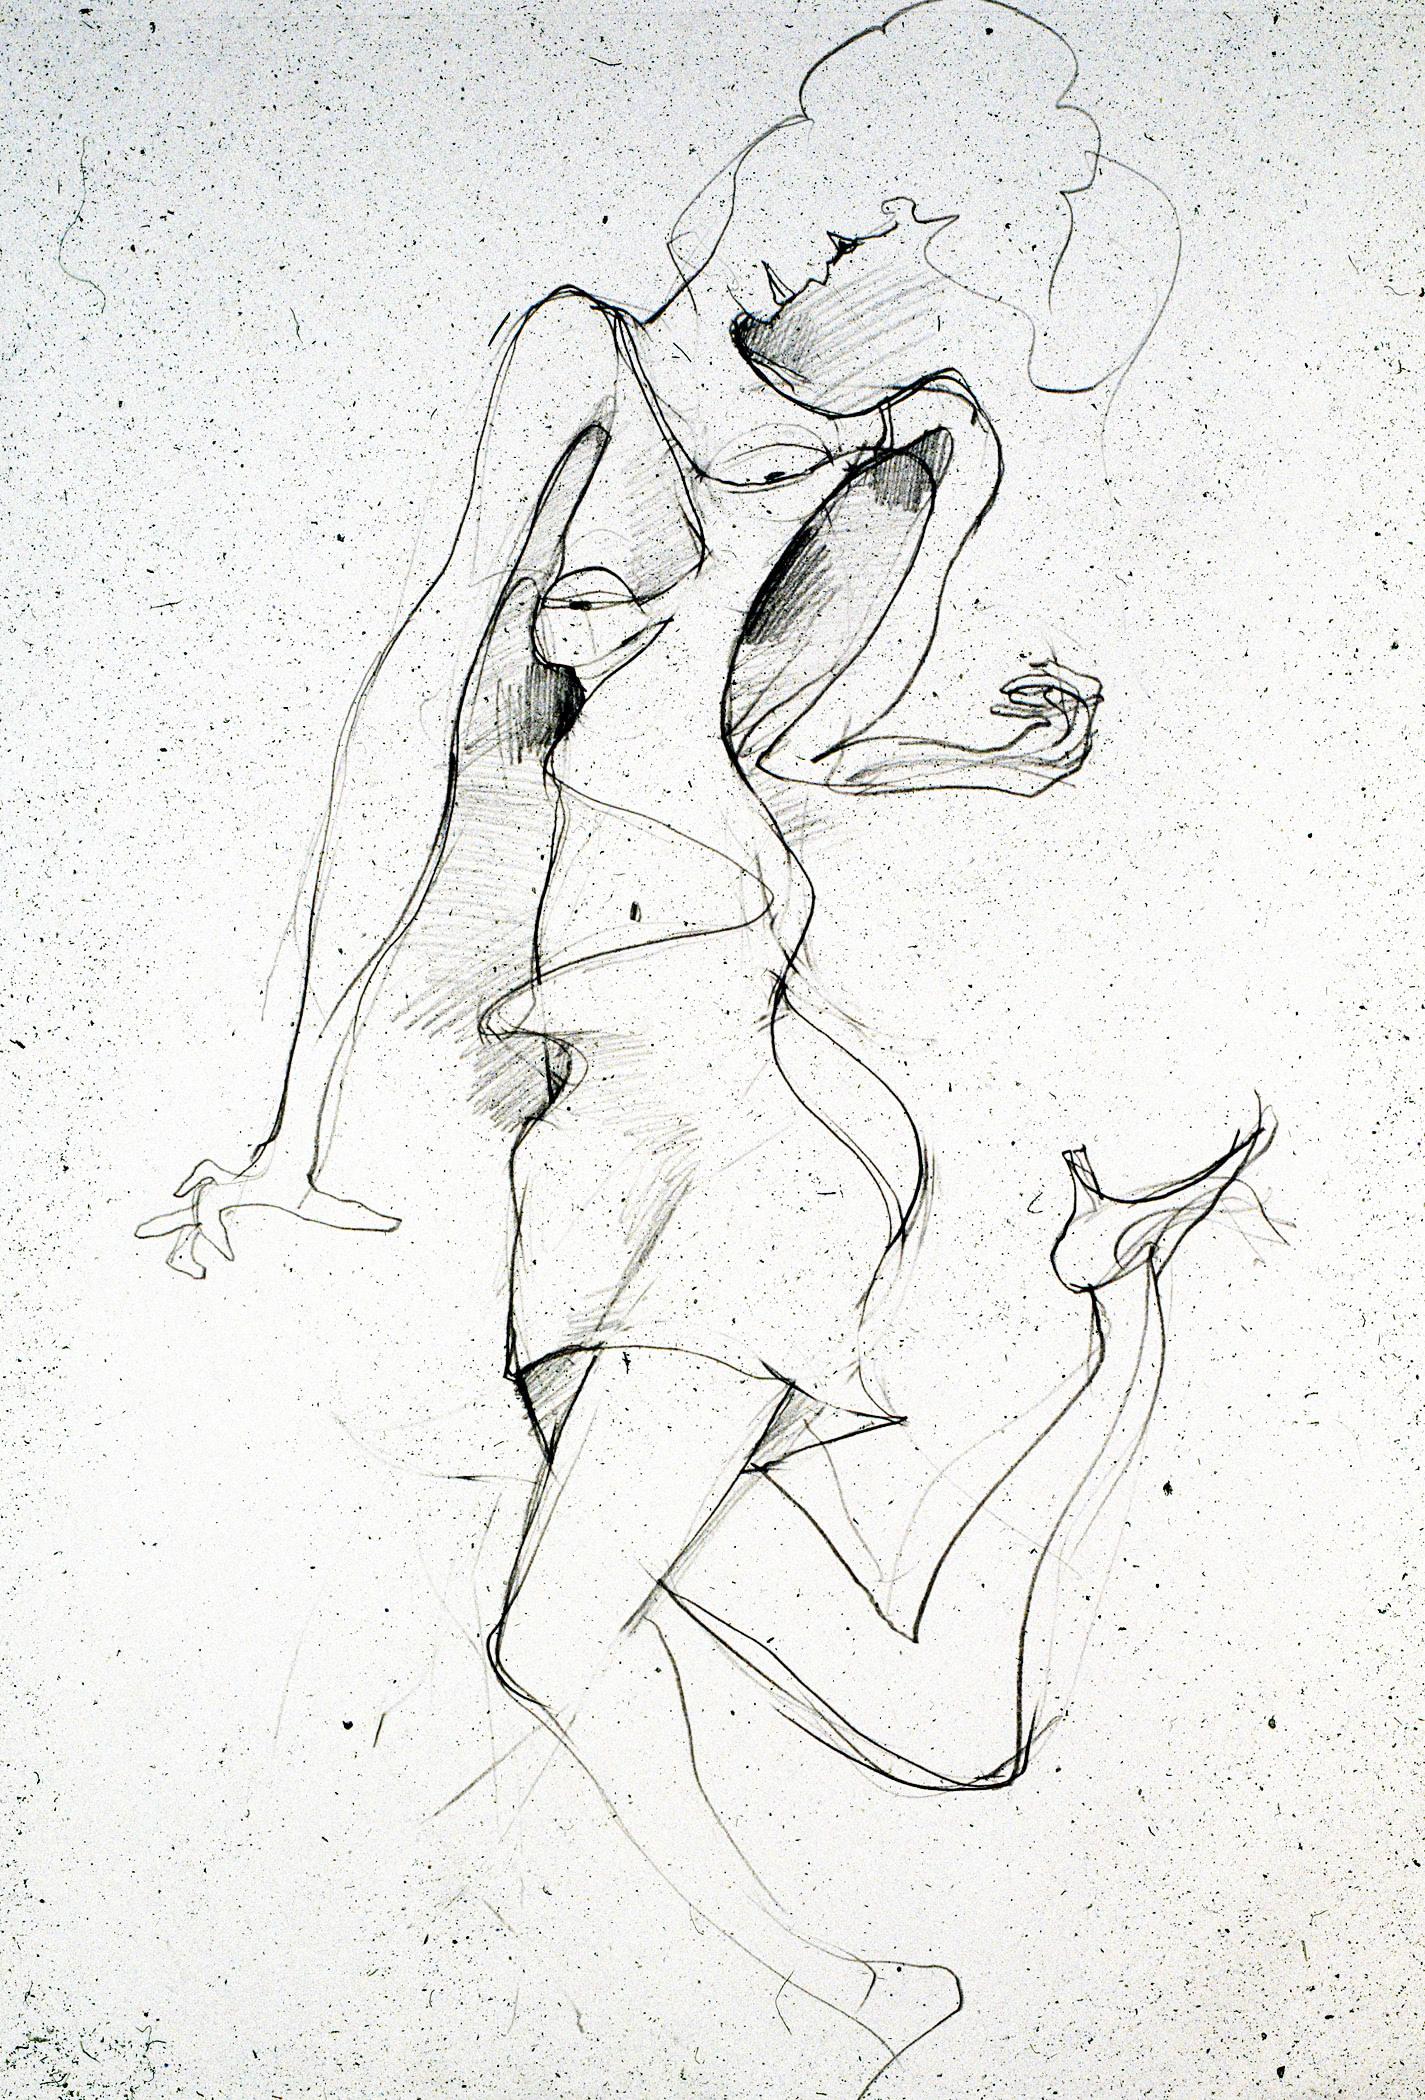 2005  Graphite on paper  24x18 in.